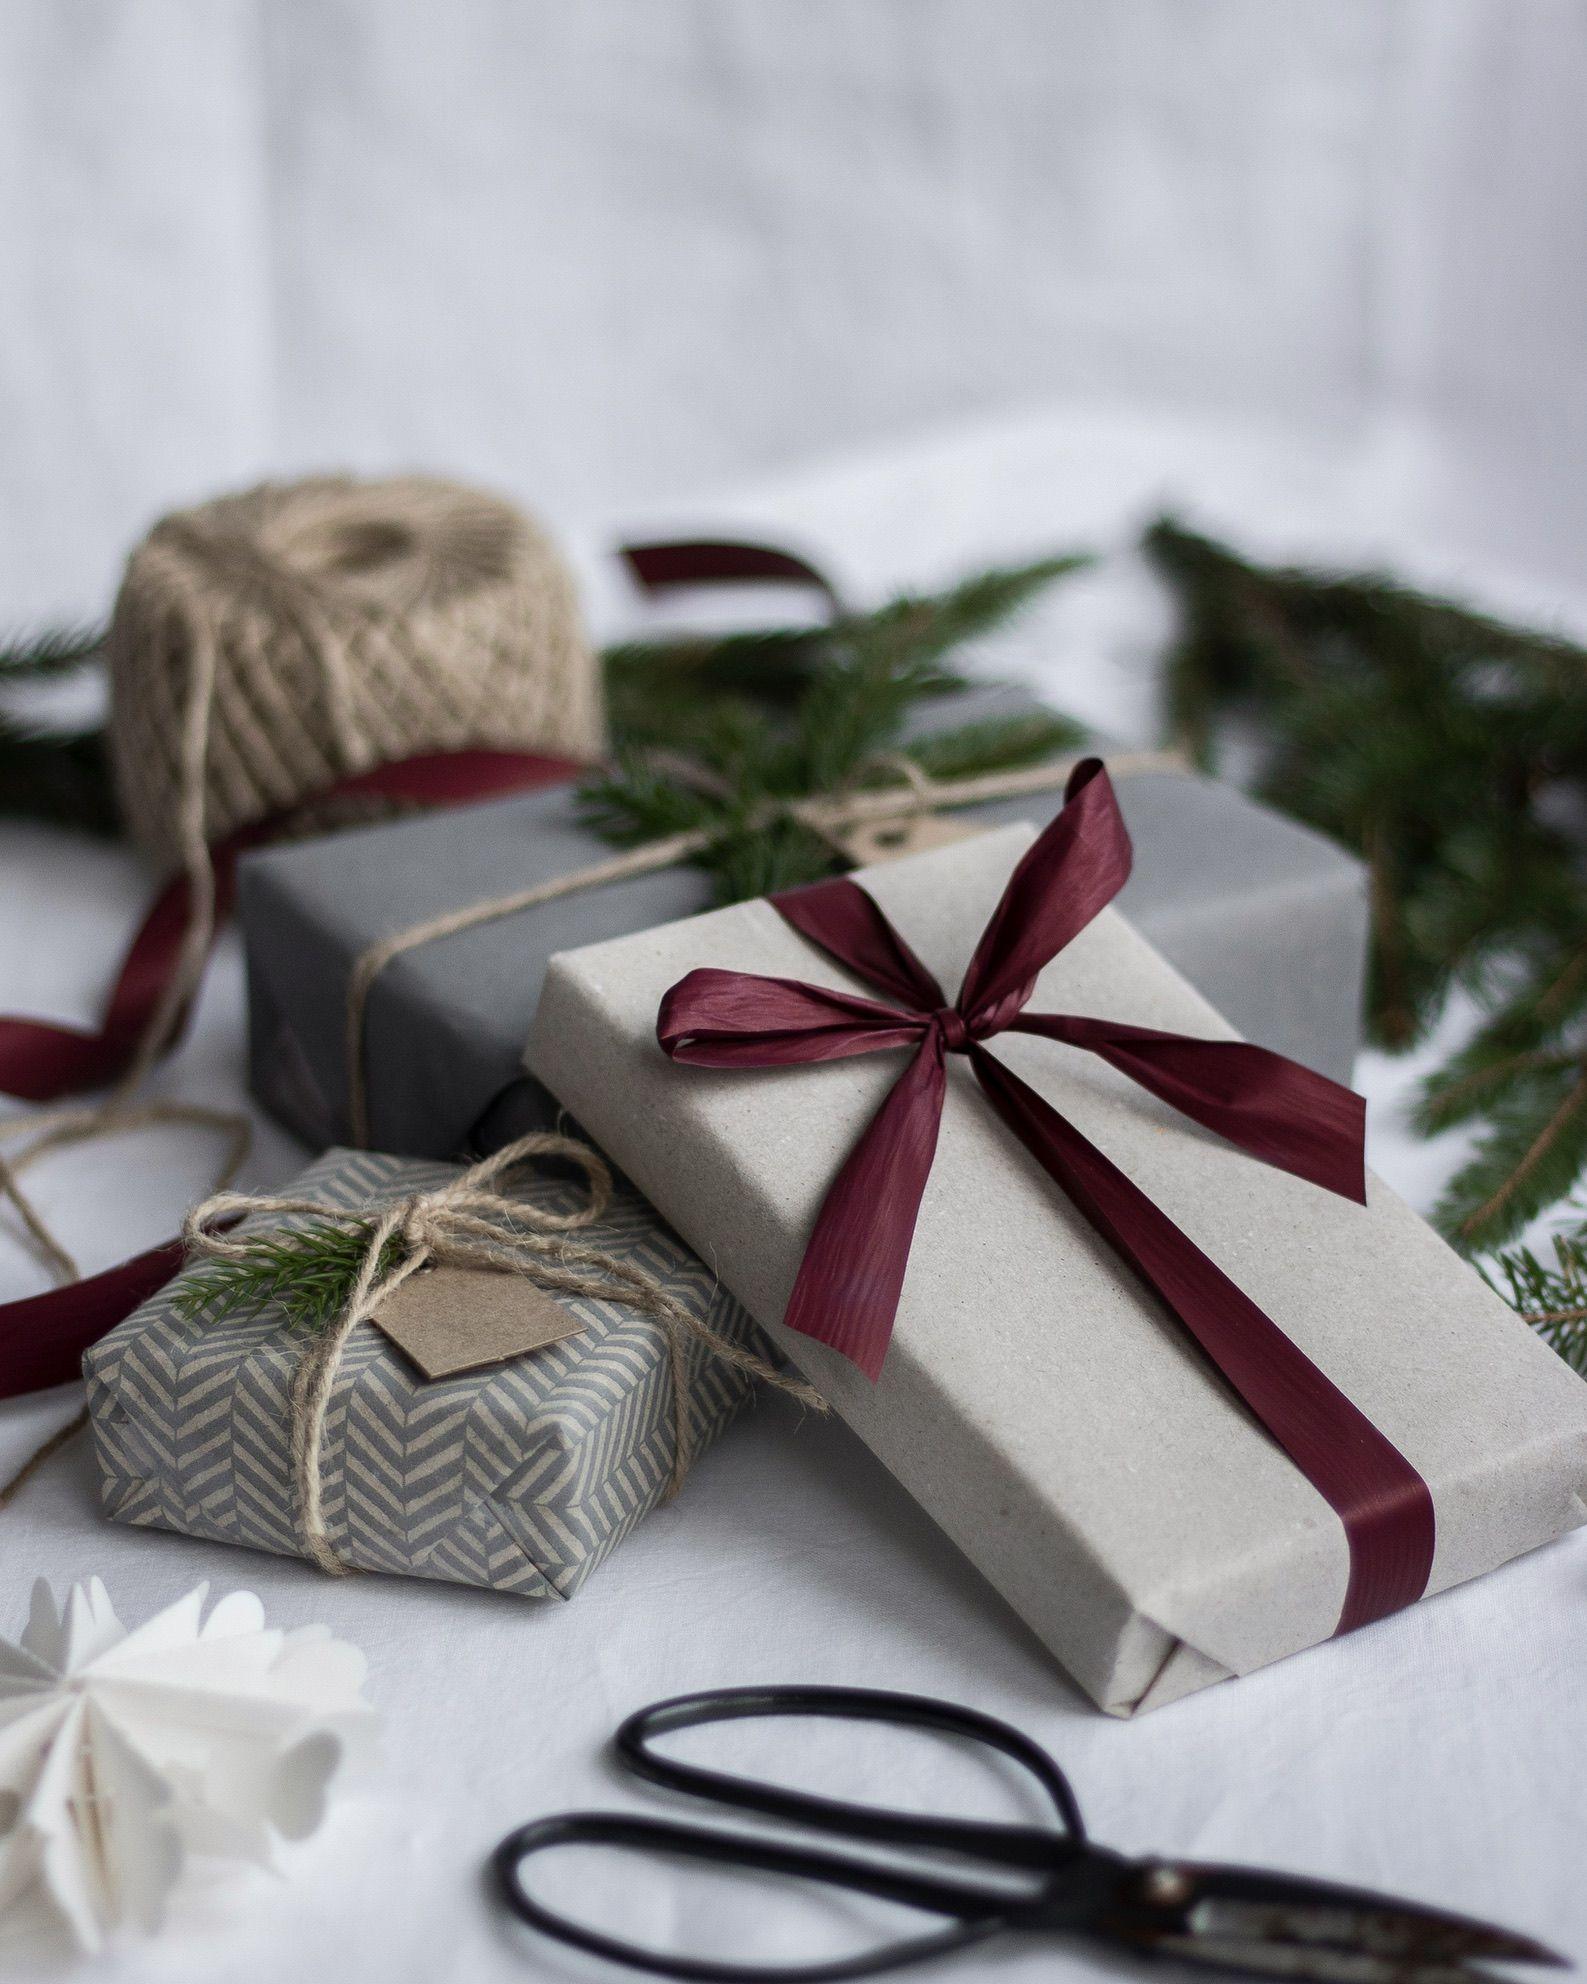 Simple and Minimal Christmas gift wrapping ideas | Christmas ...